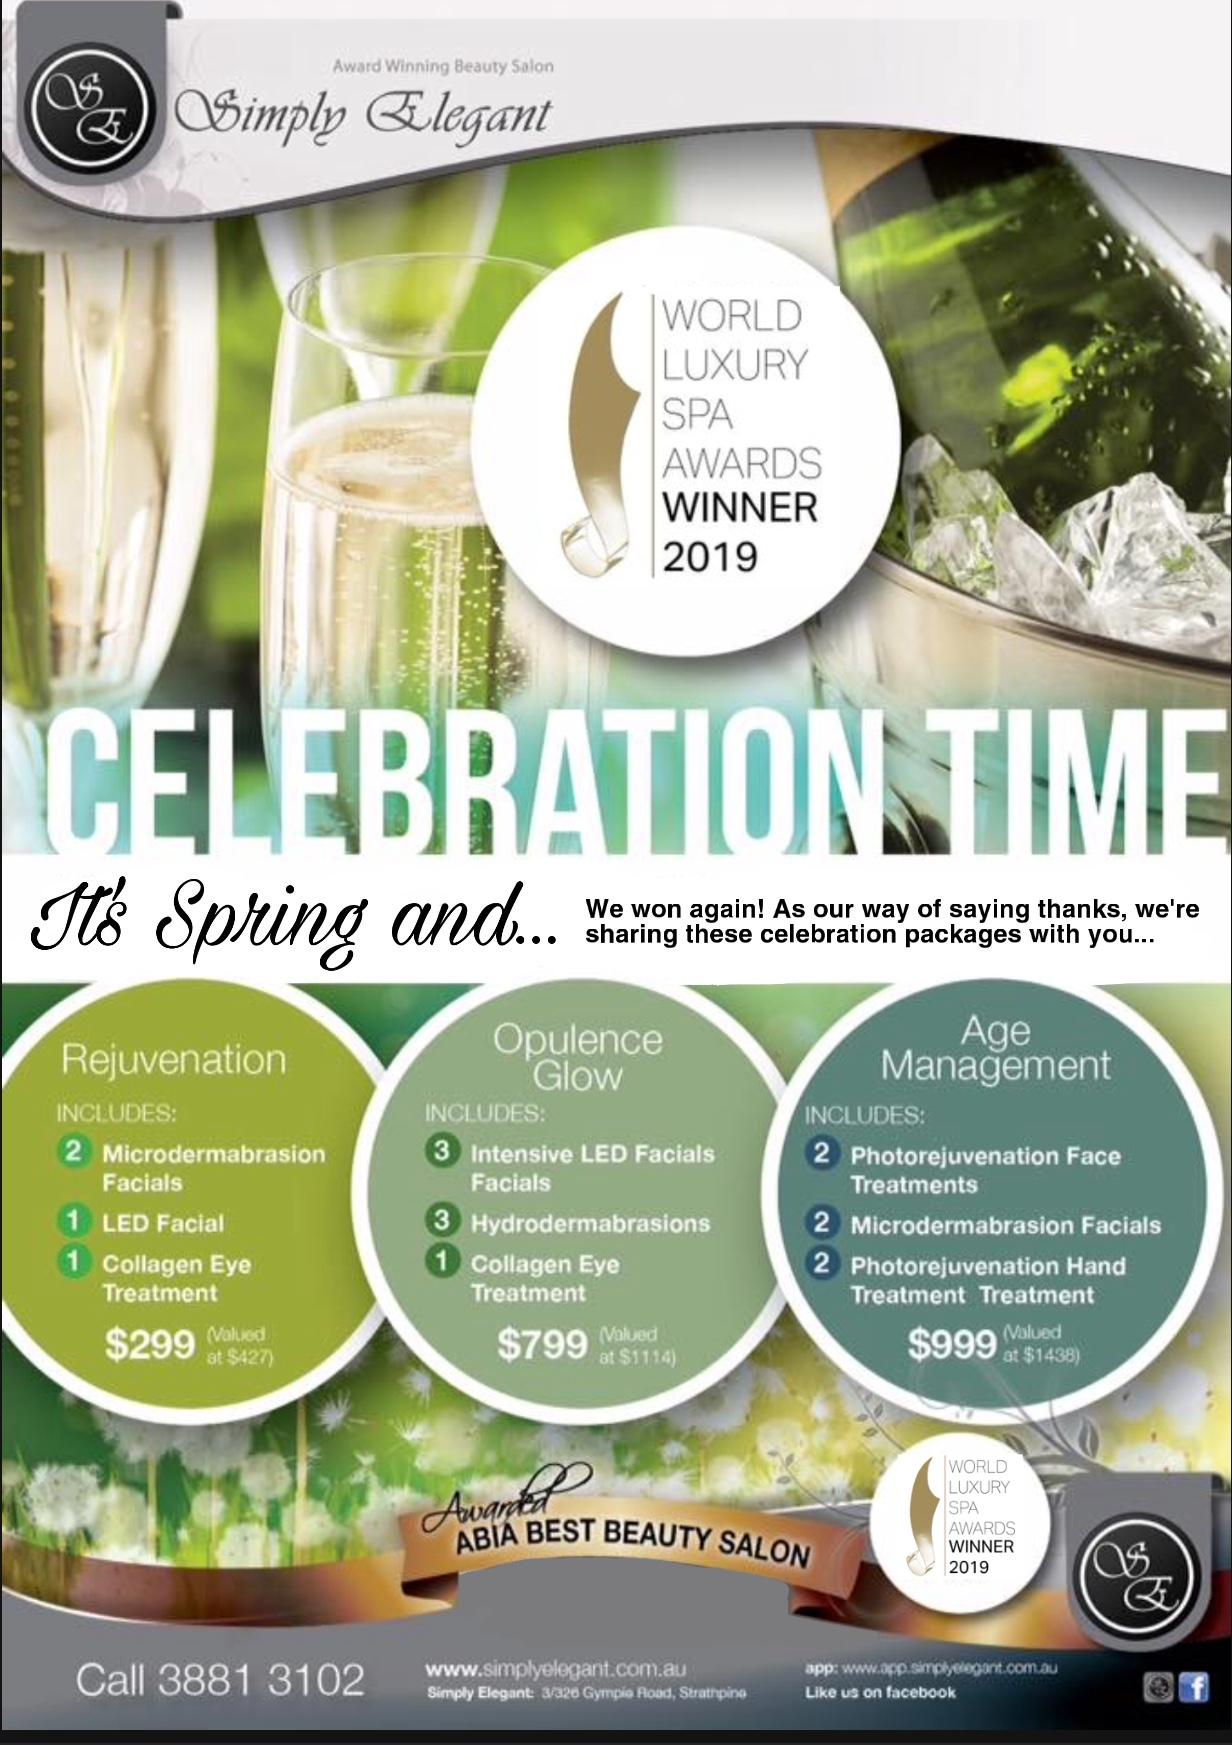 Celebration Time at Simply Elegant